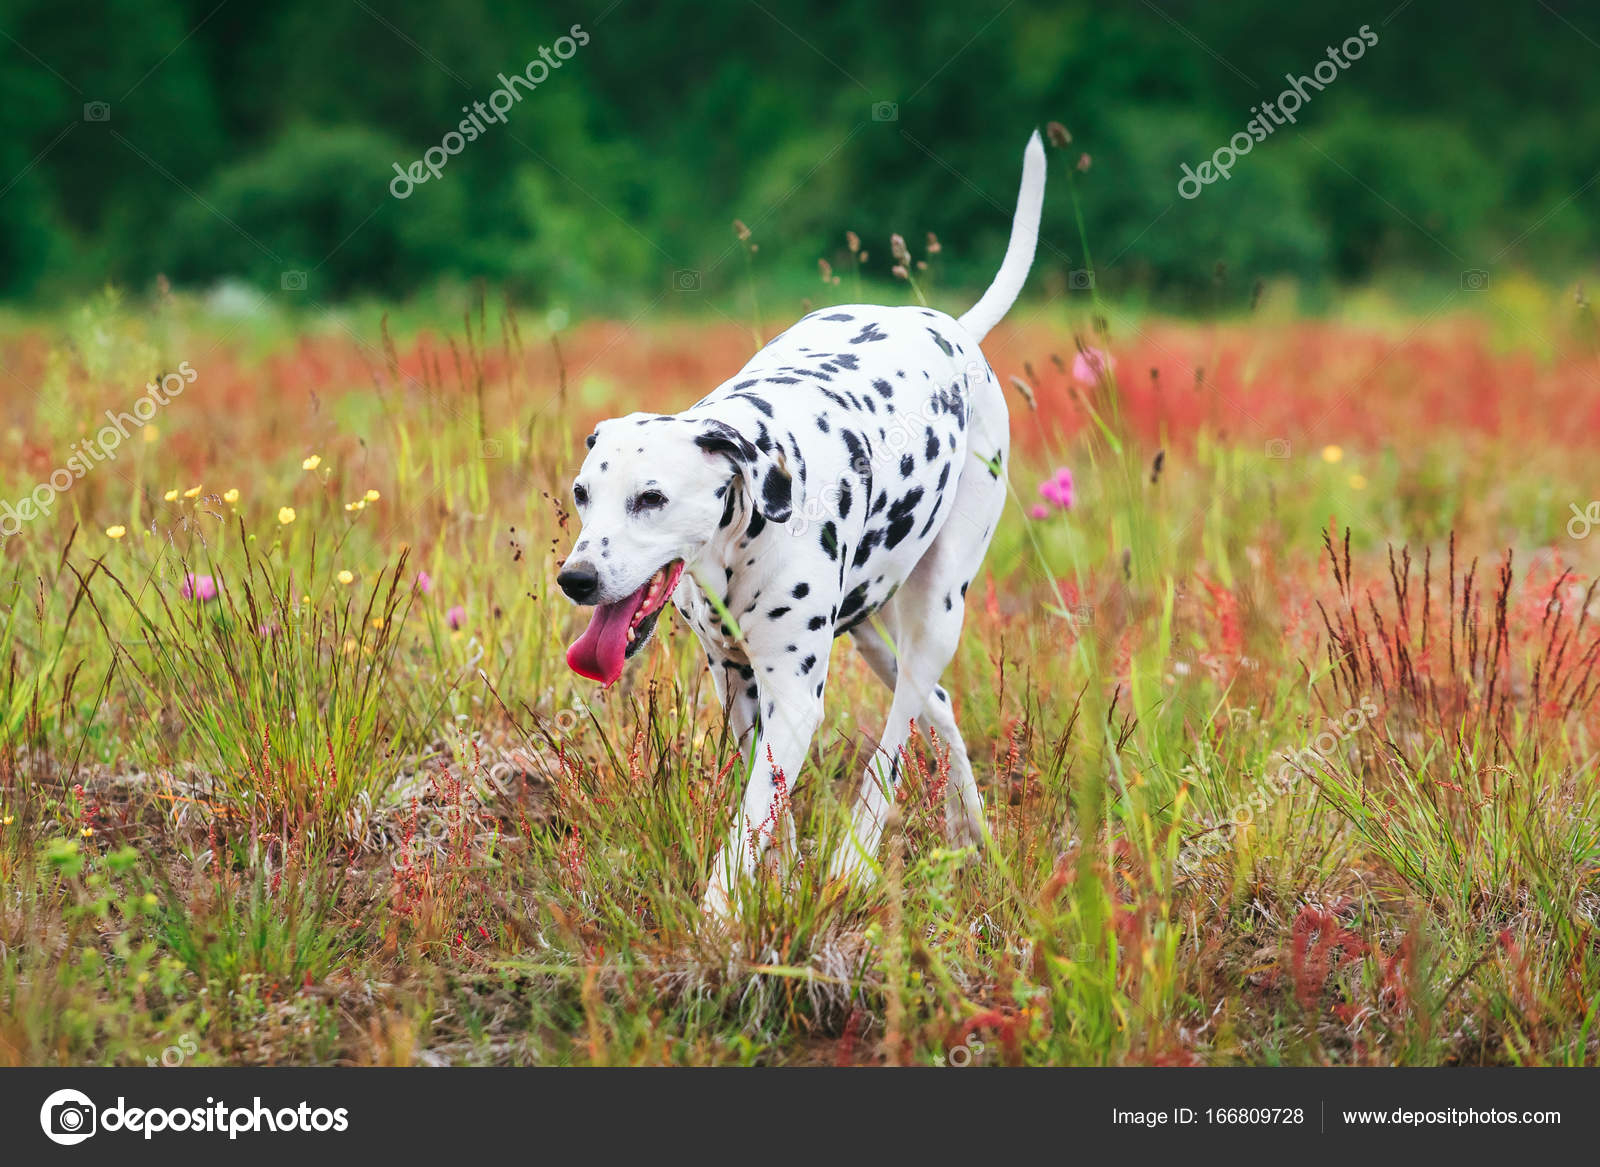 Cute Dog Running On Field Stock Photo C Art2435 166809728